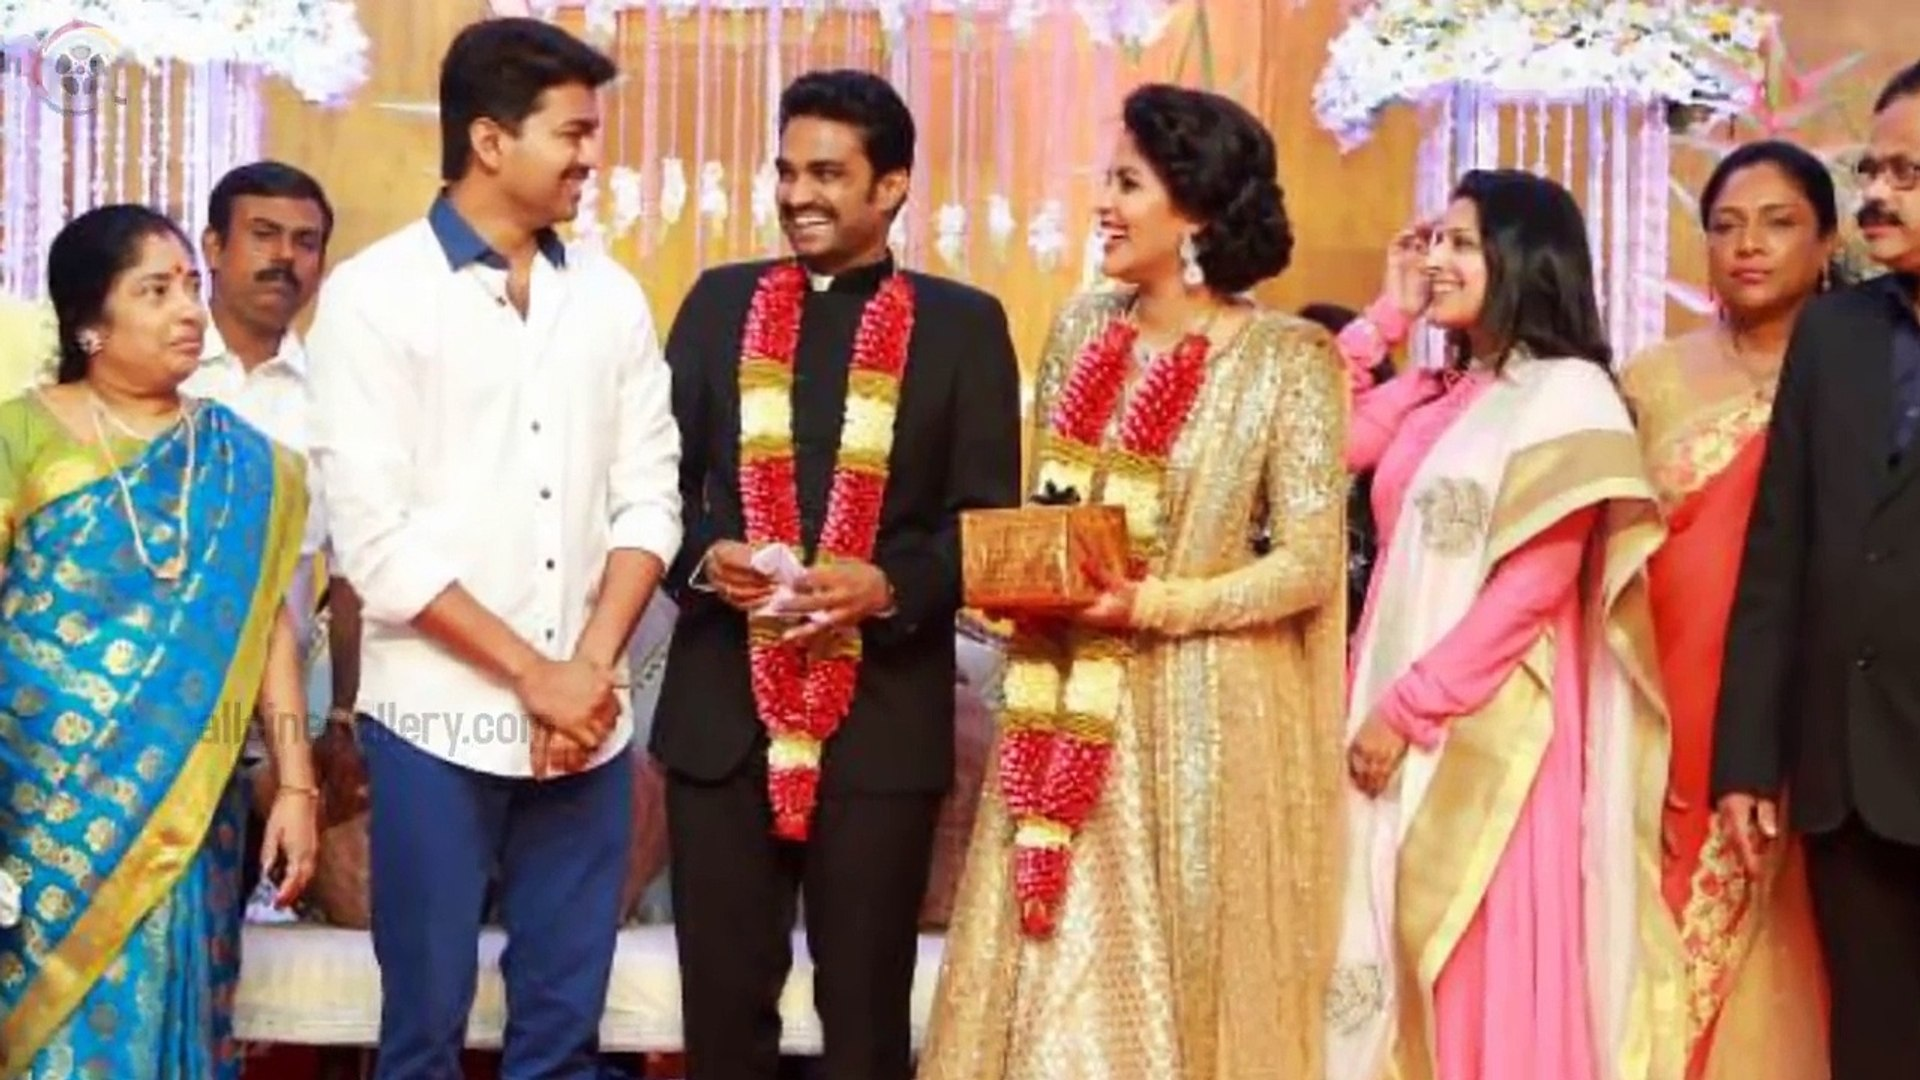 Actor Vijay Family Photos with Wife Sangeetha, Son Sanjay, Daughter Divya  Saasha